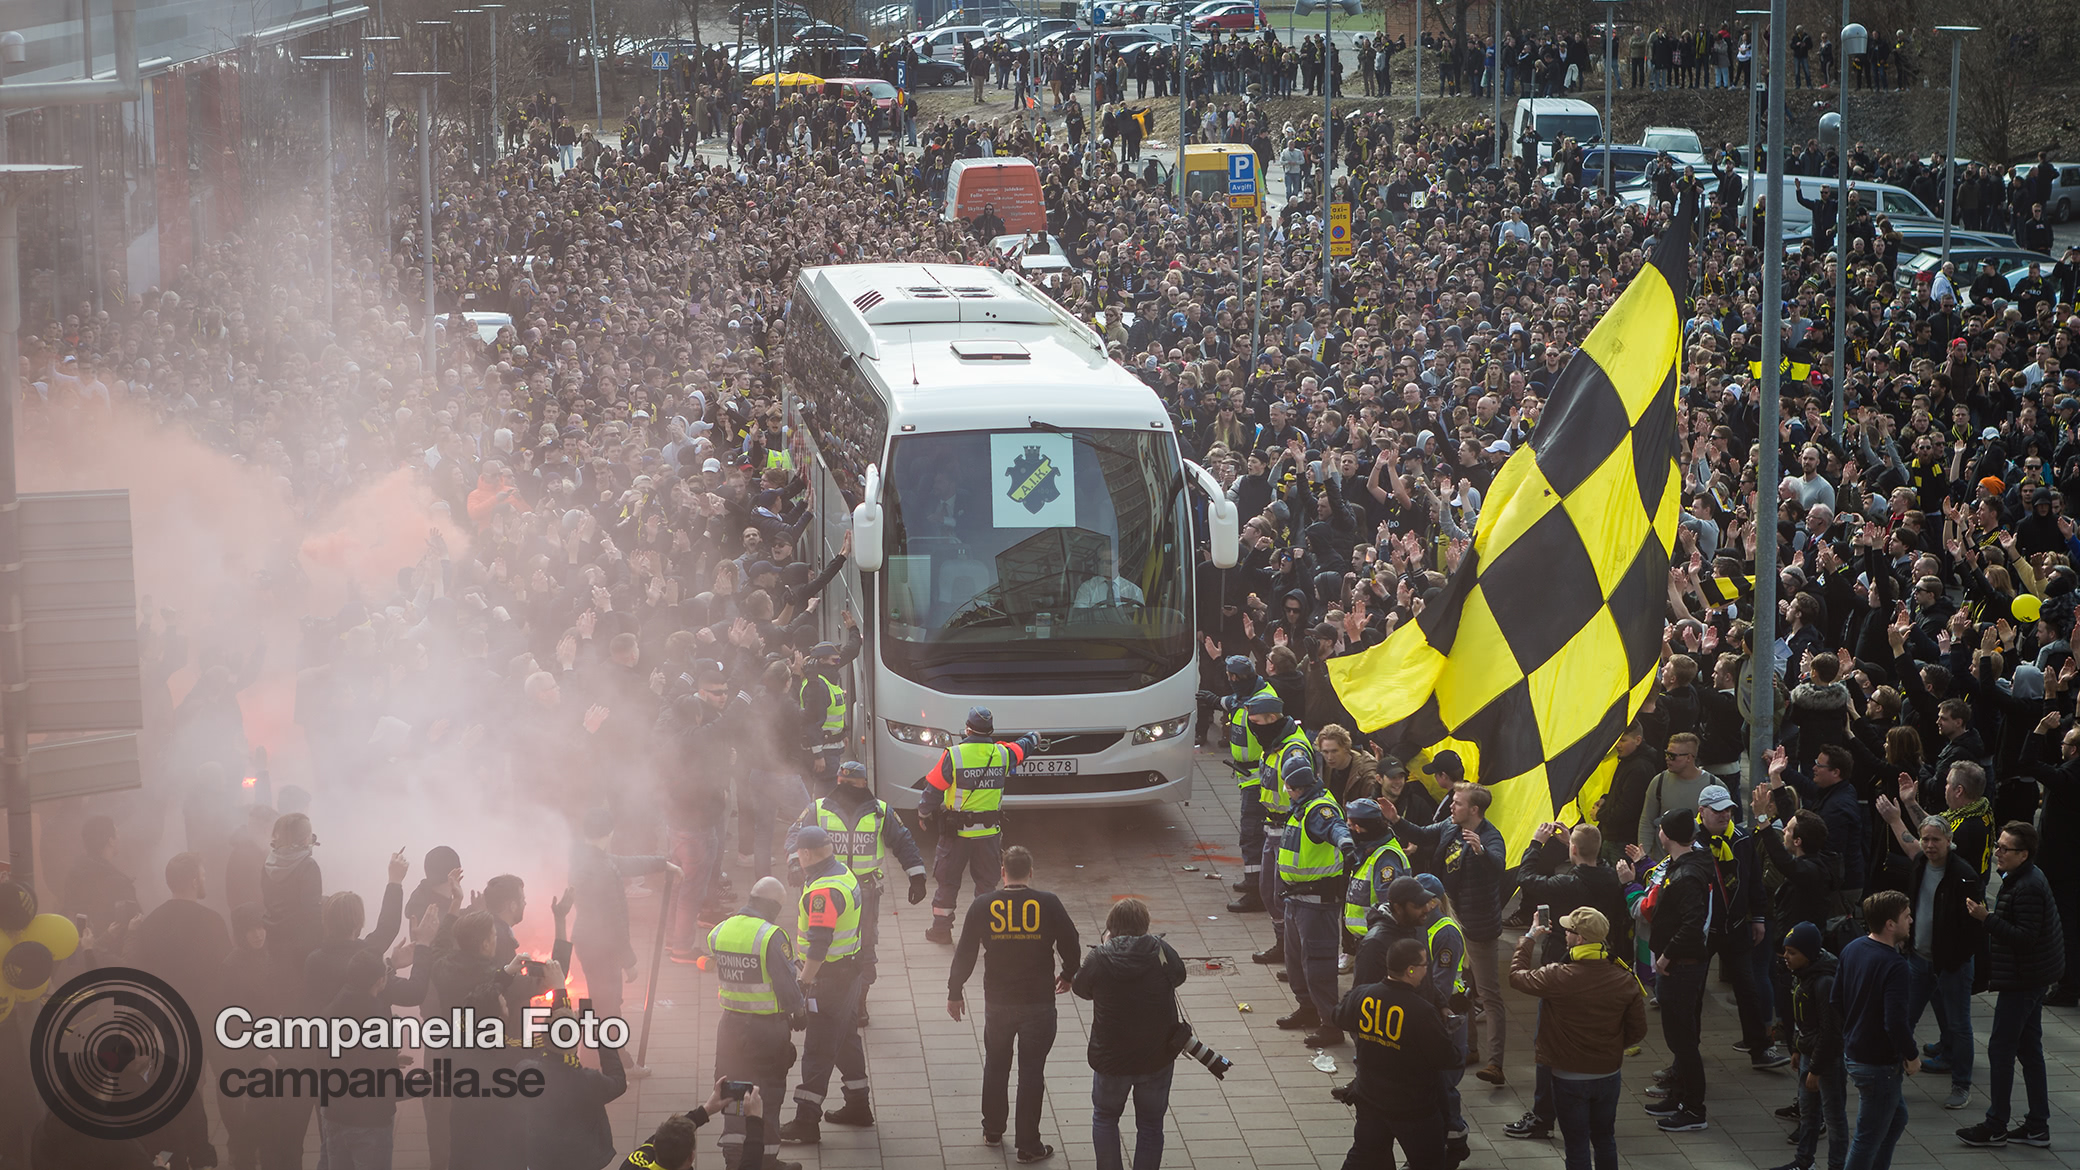 Opening weekend of the 2017 Allsvenskan season - Michael Campanella Photography